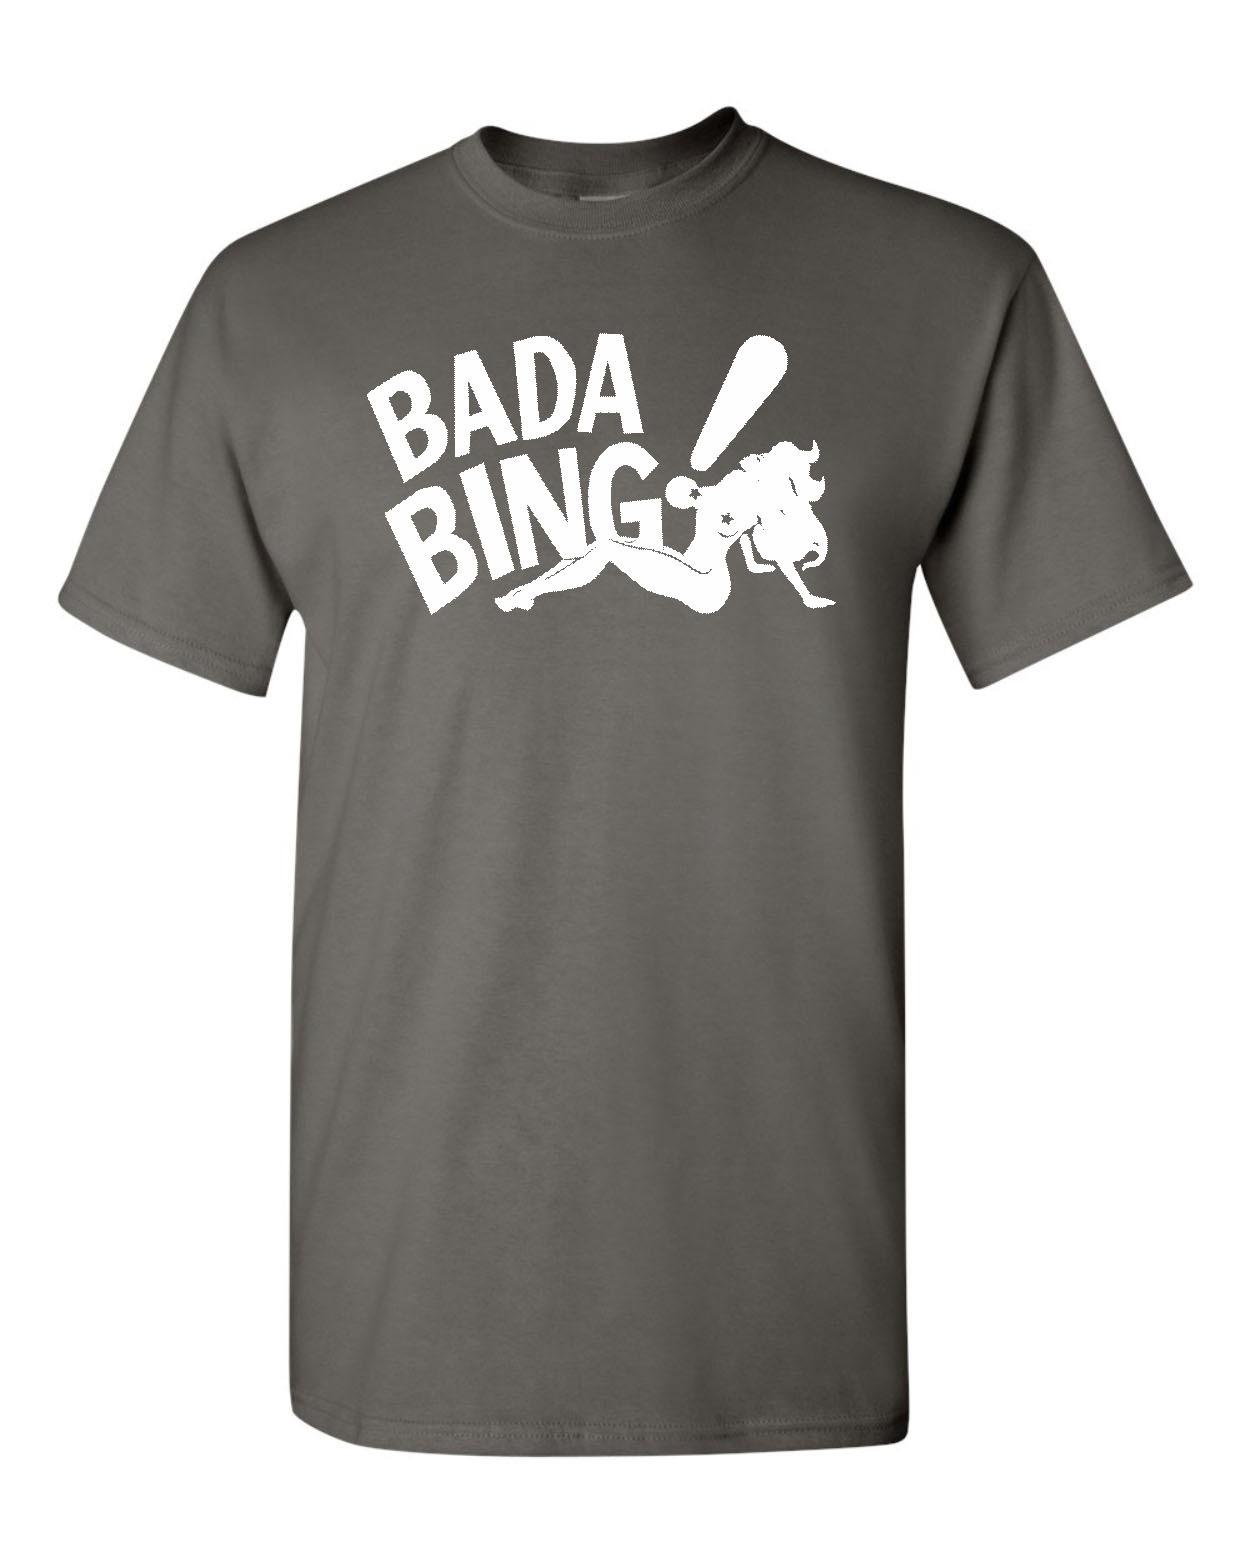 Bada Bing Sopranos Jersey Mafia Stripper Tony Mens Tee Shirt 1819